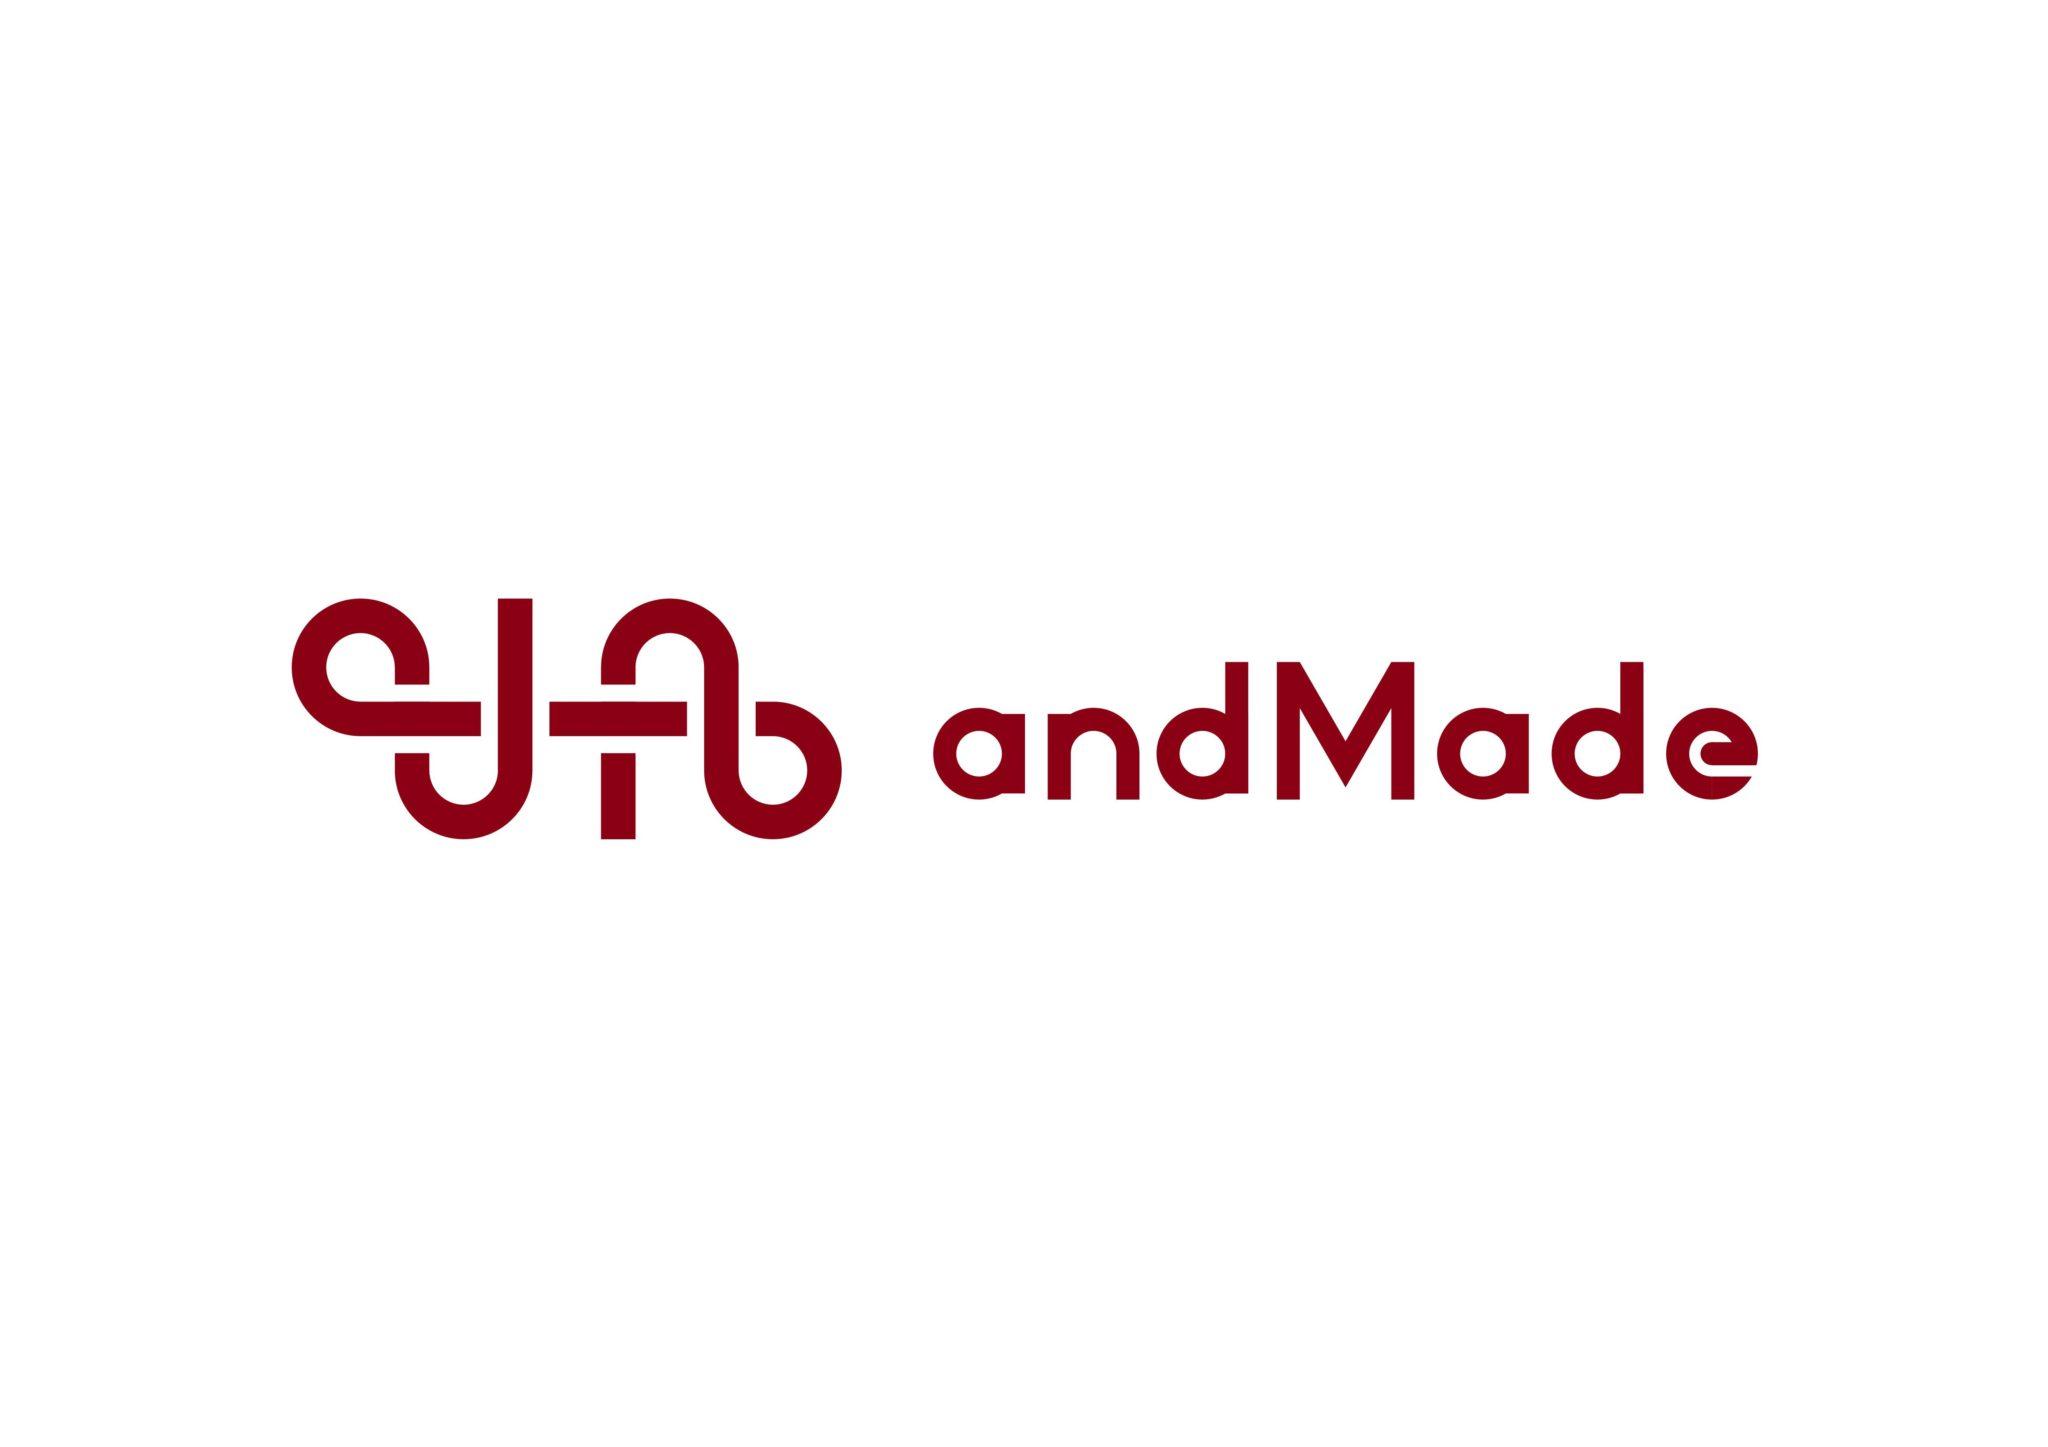 andMade,ミシンレンタル,縫い方,ミシン針